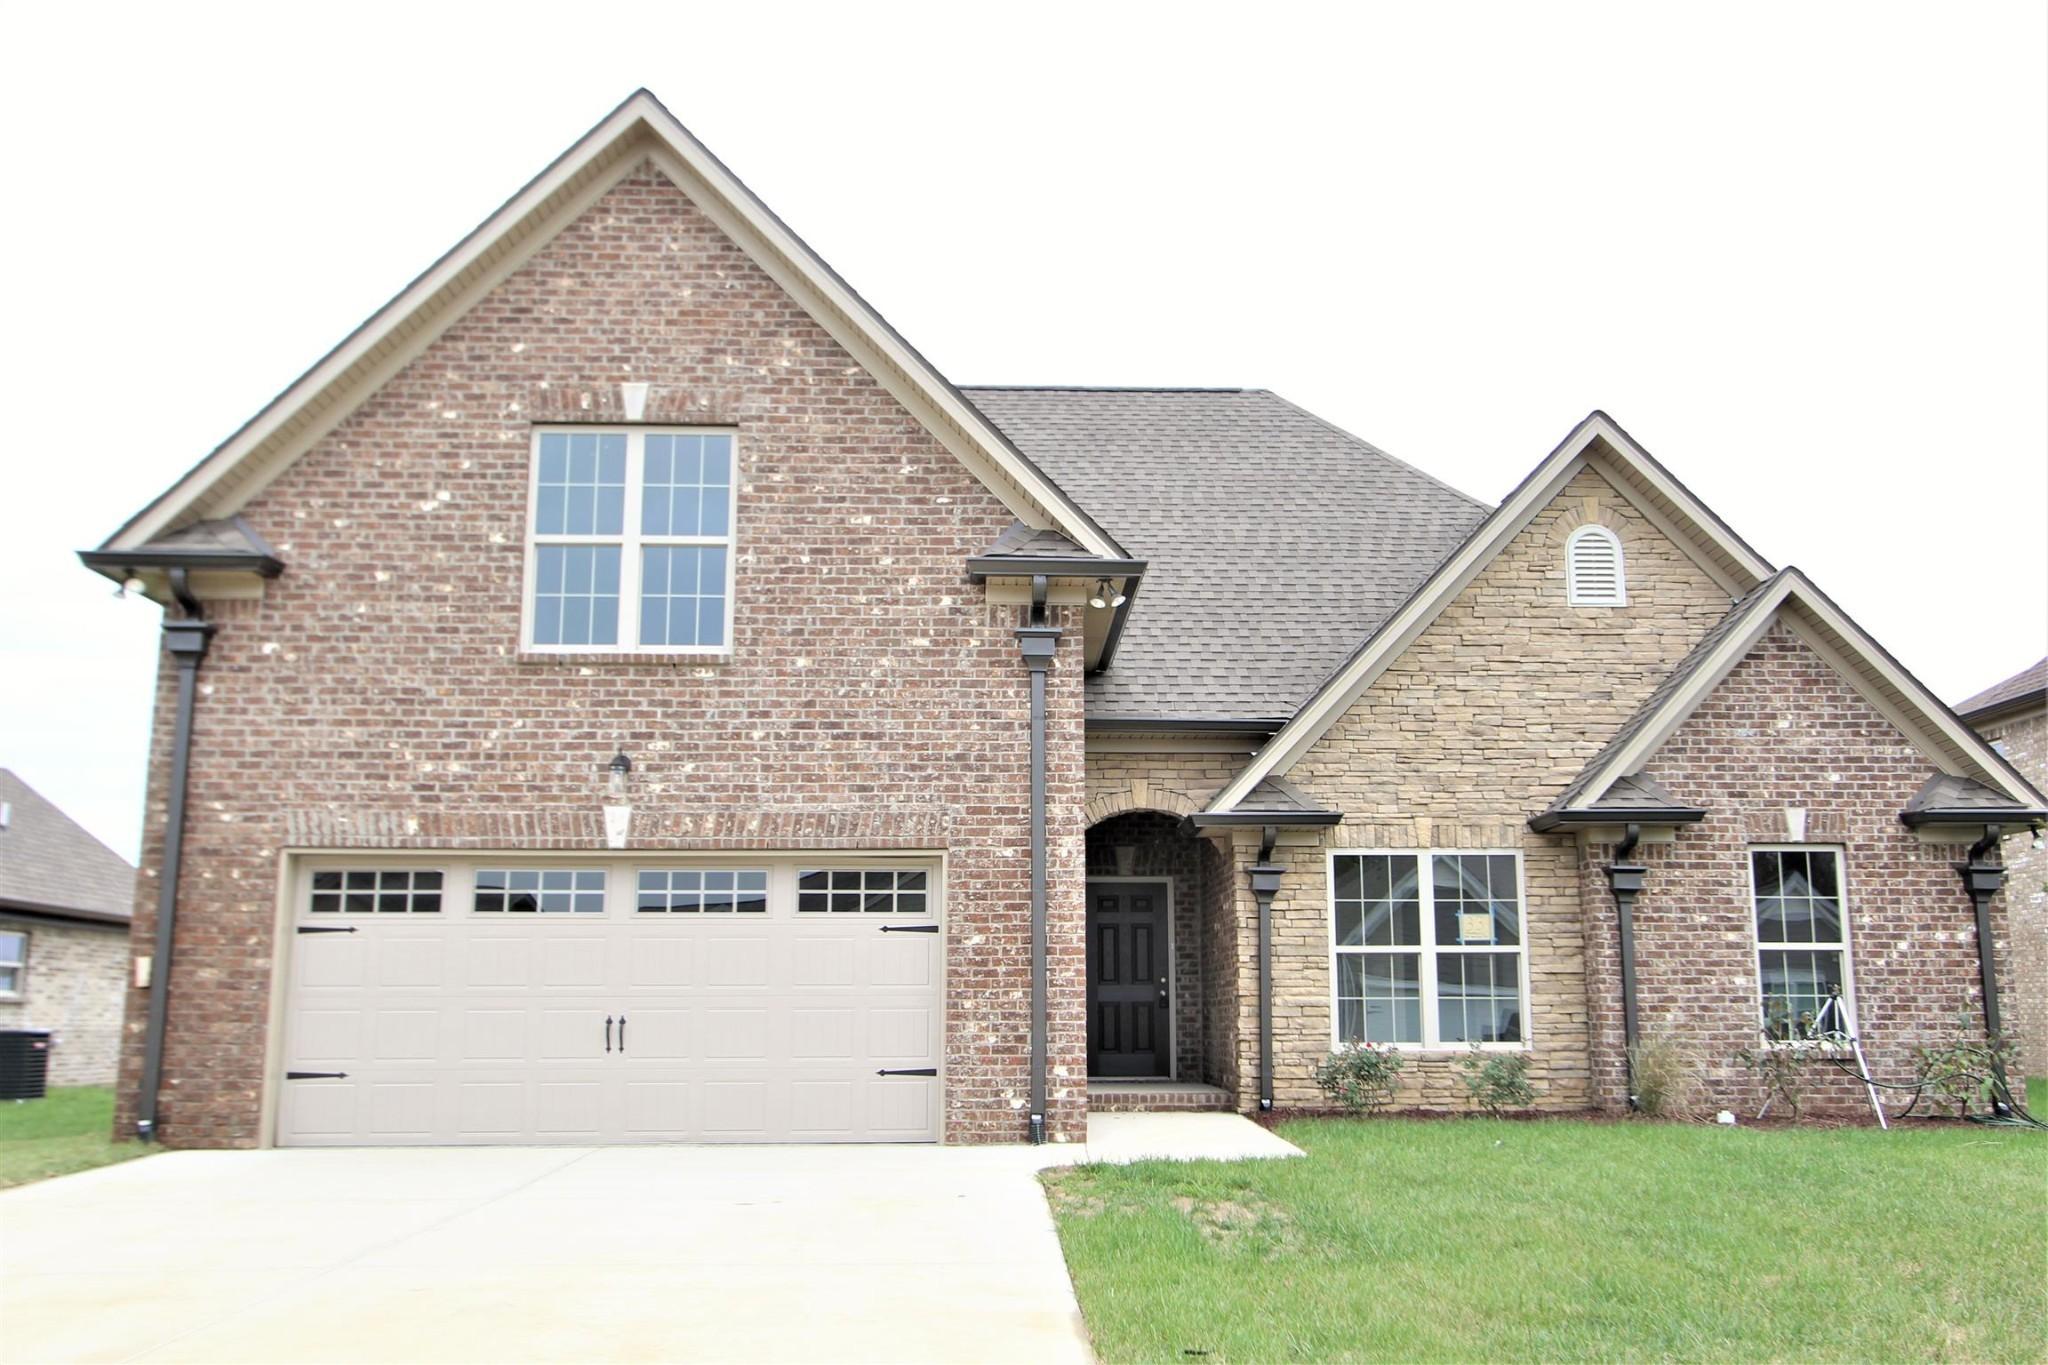 144 Neecee Dr #33-C, Smyrna, TN 37167 - Smyrna, TN real estate listing